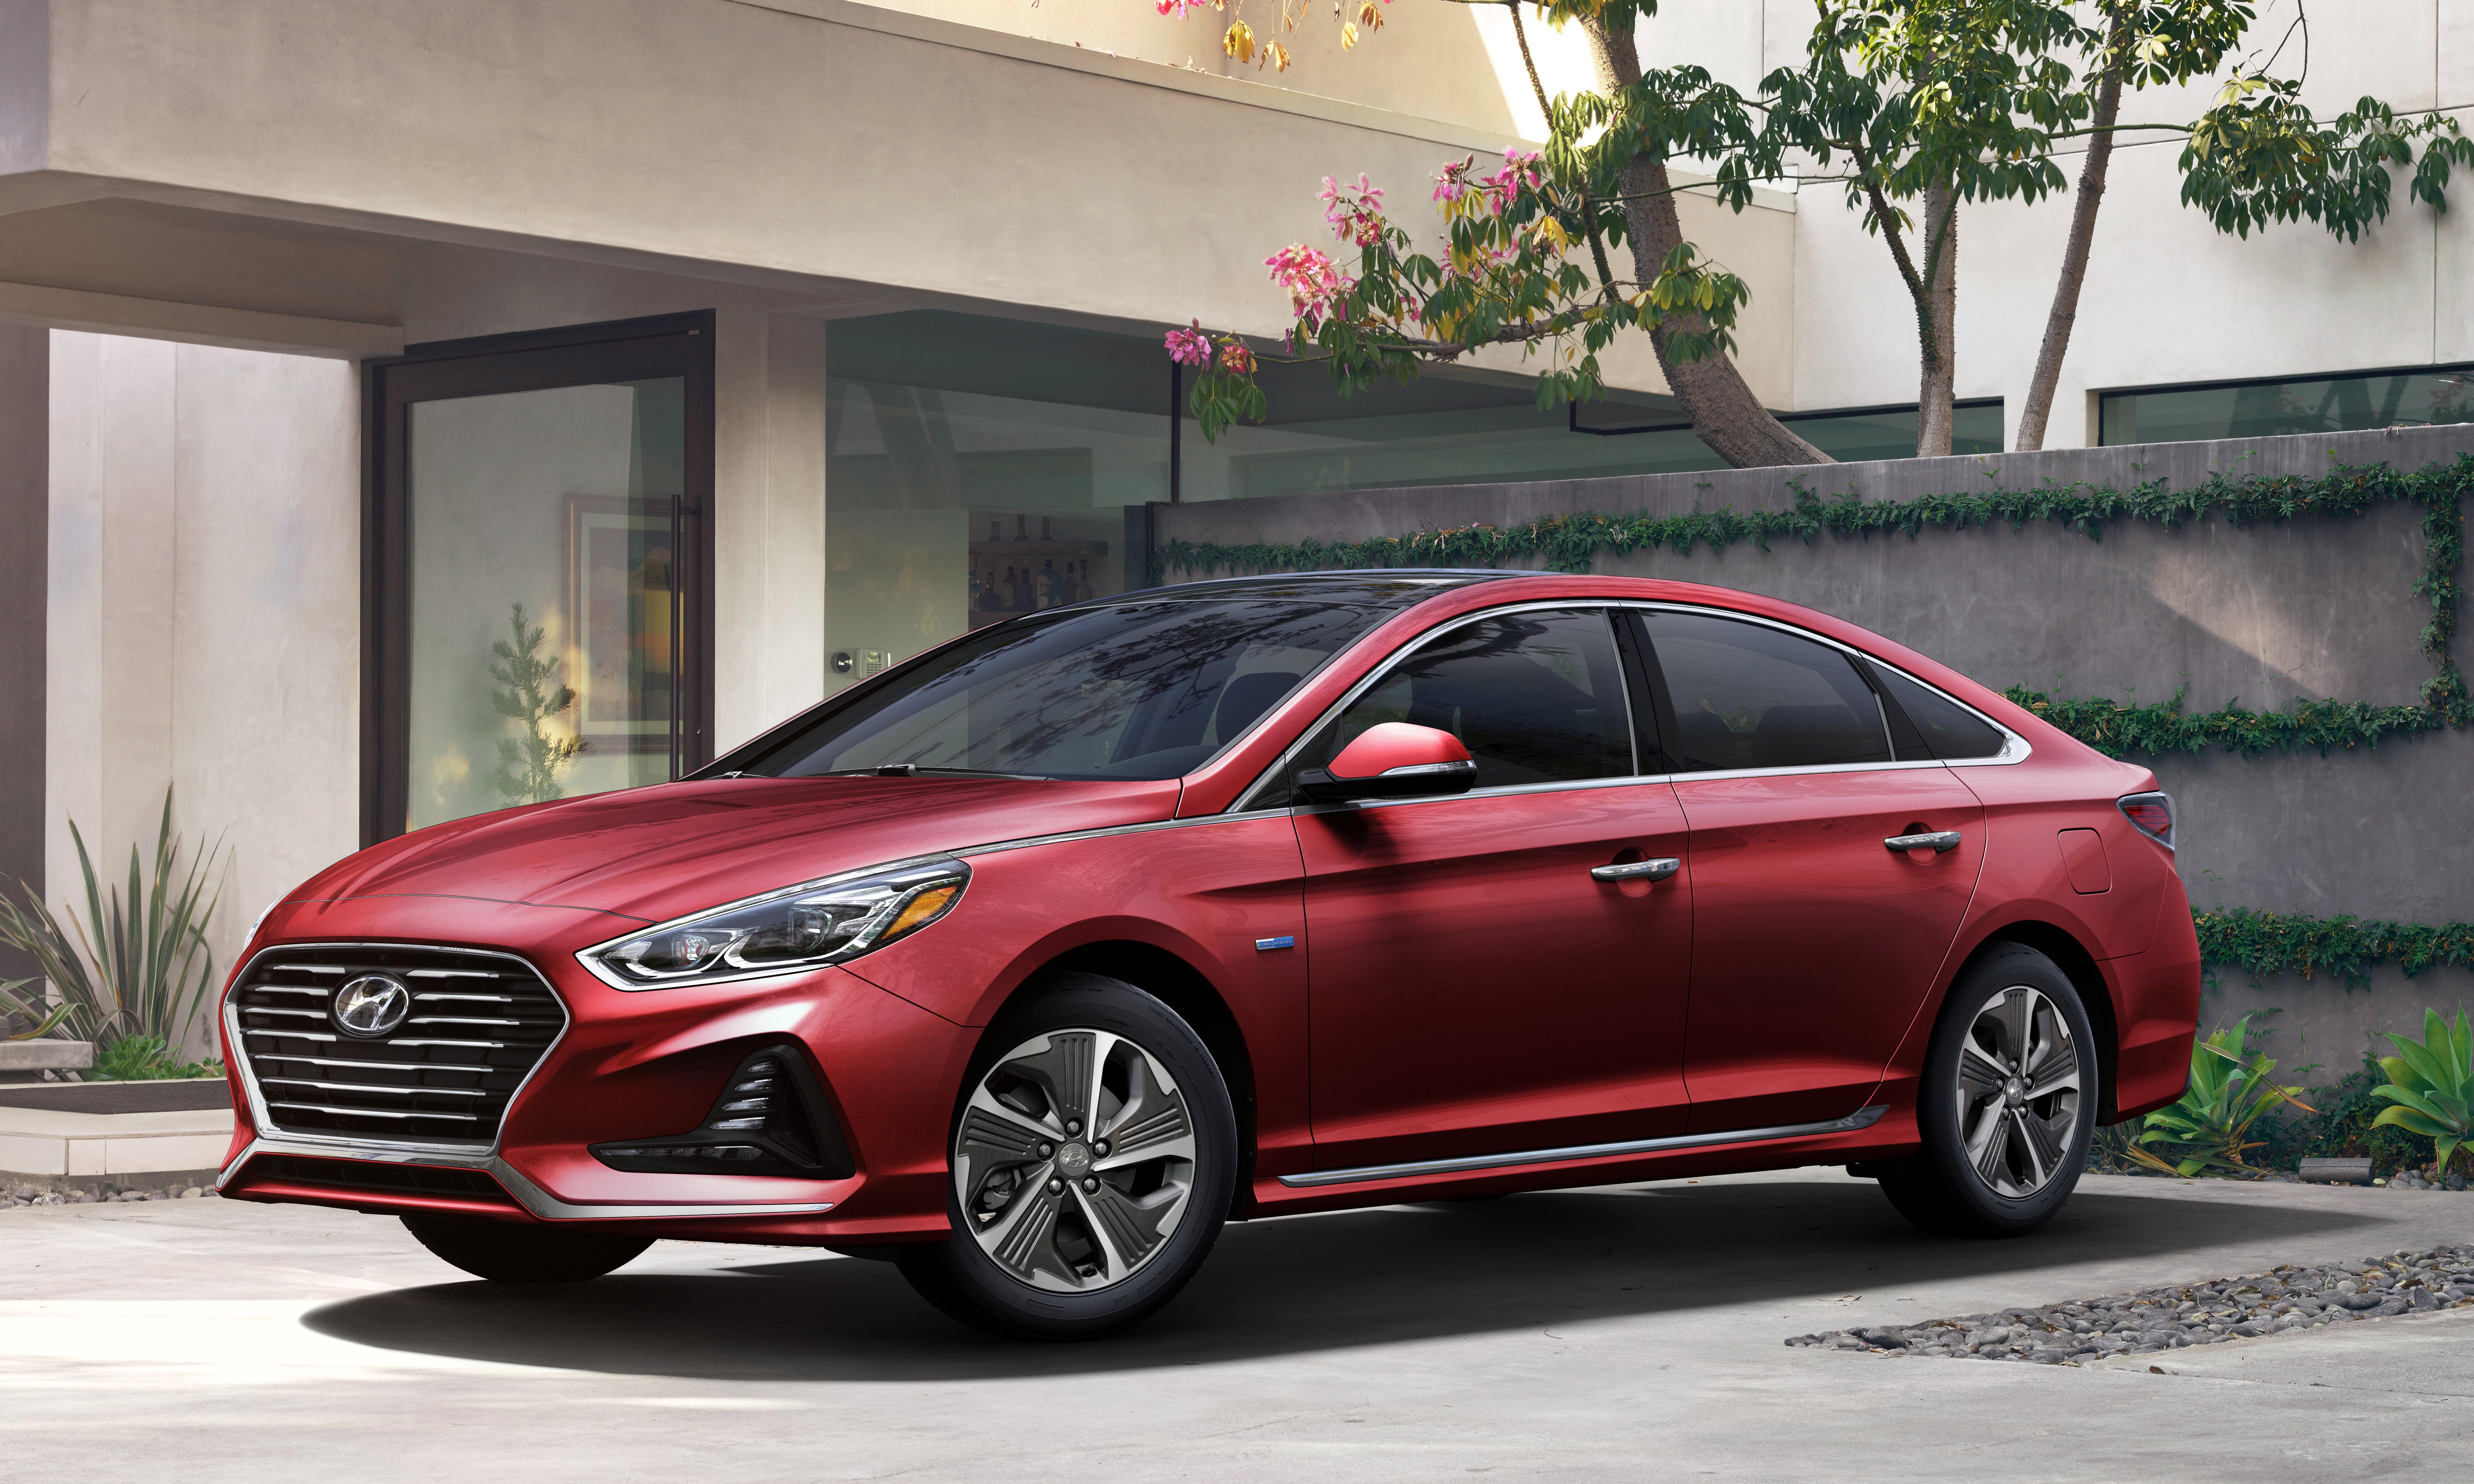 Hyundai Sonata Hybrid parked in driveway